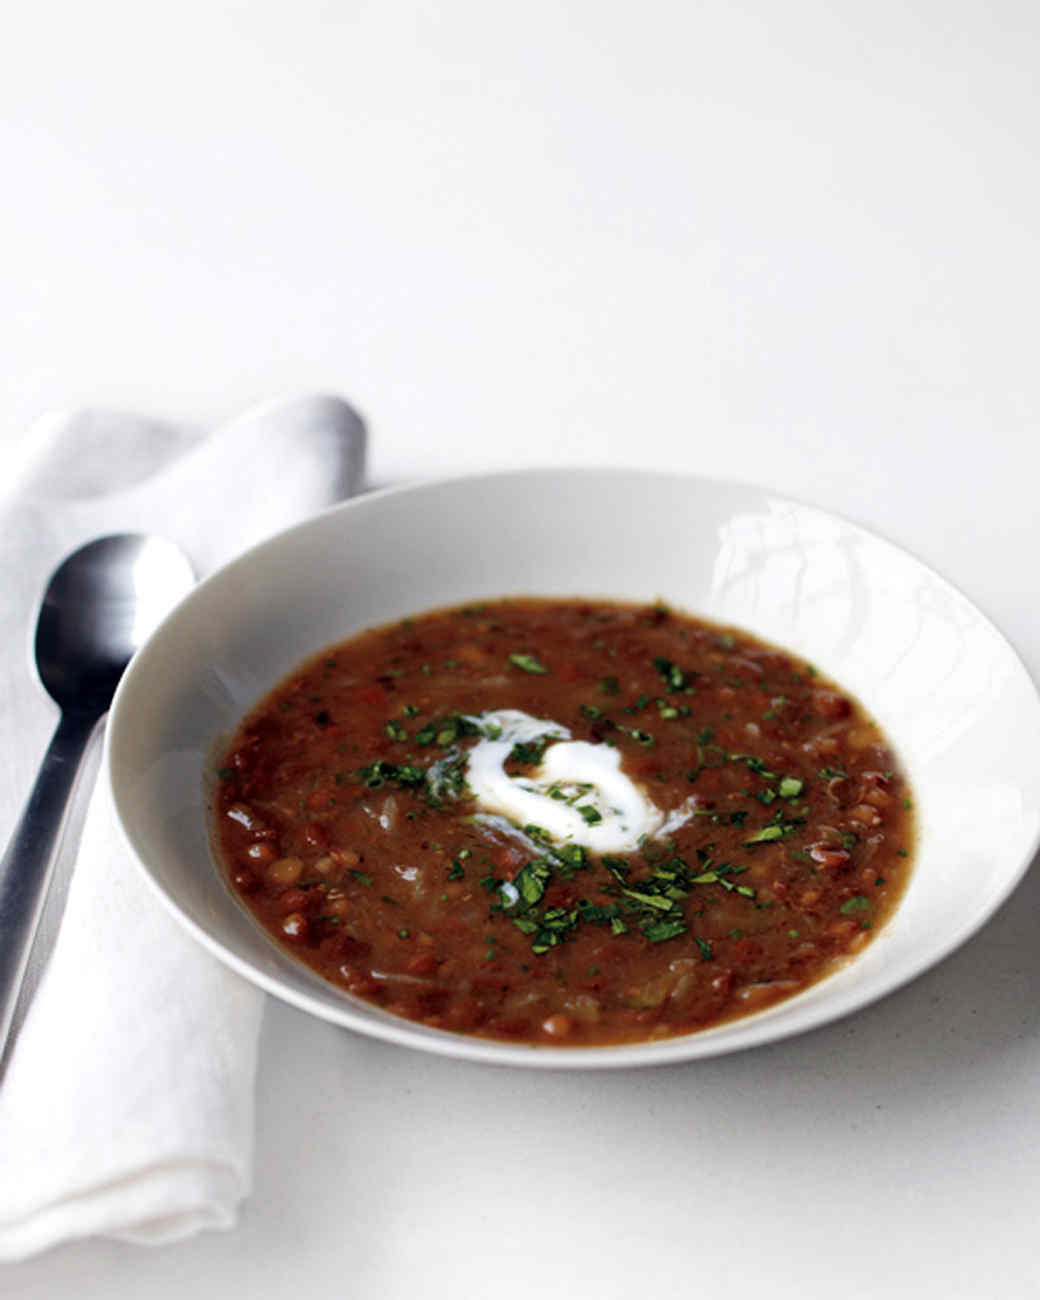 med105502_0410_onion_soup.jpg